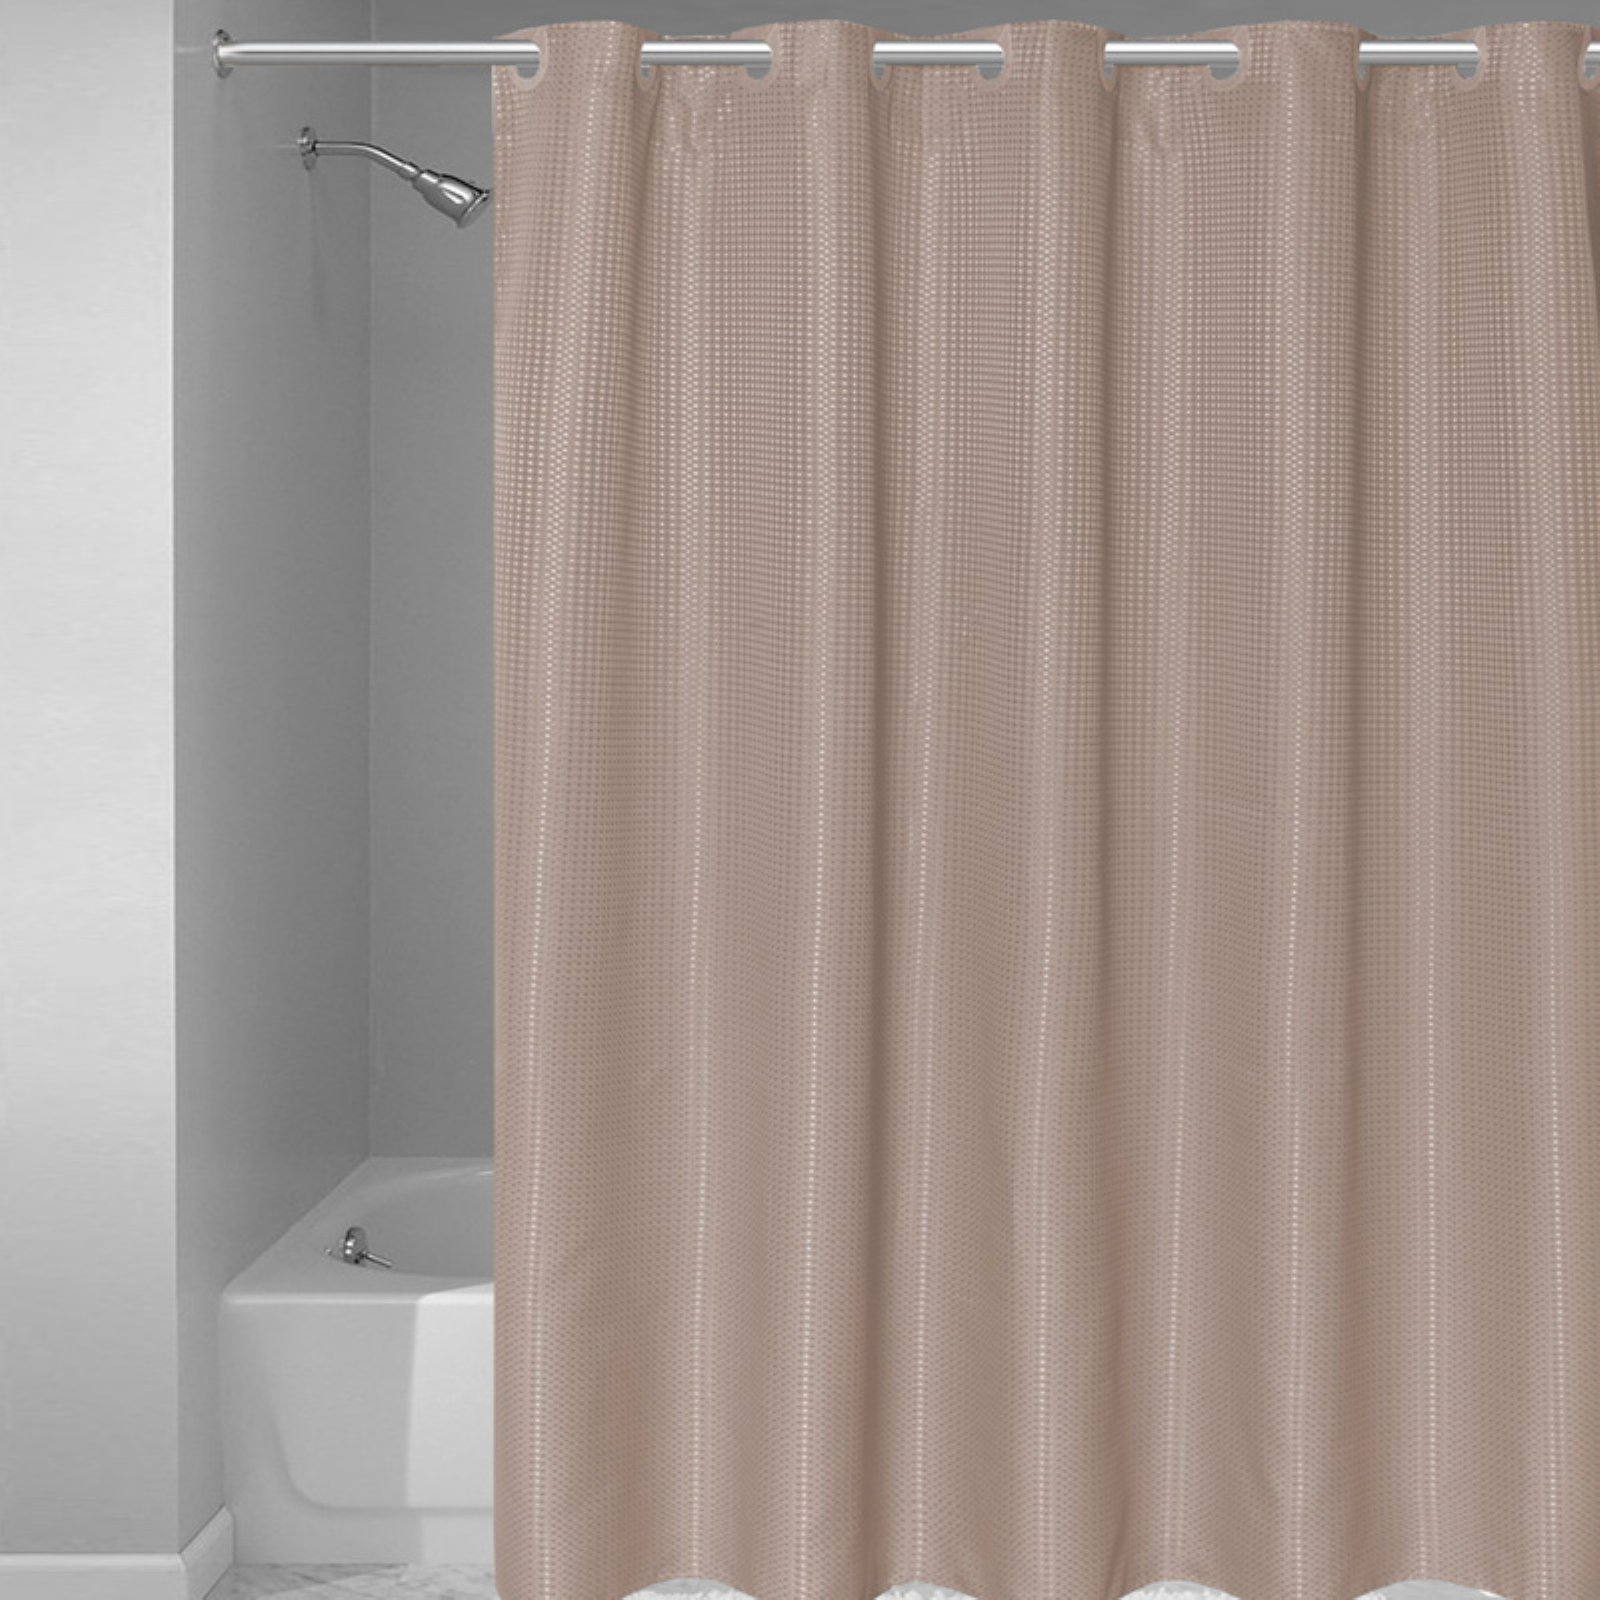 fabric shower curtain 70 x 75